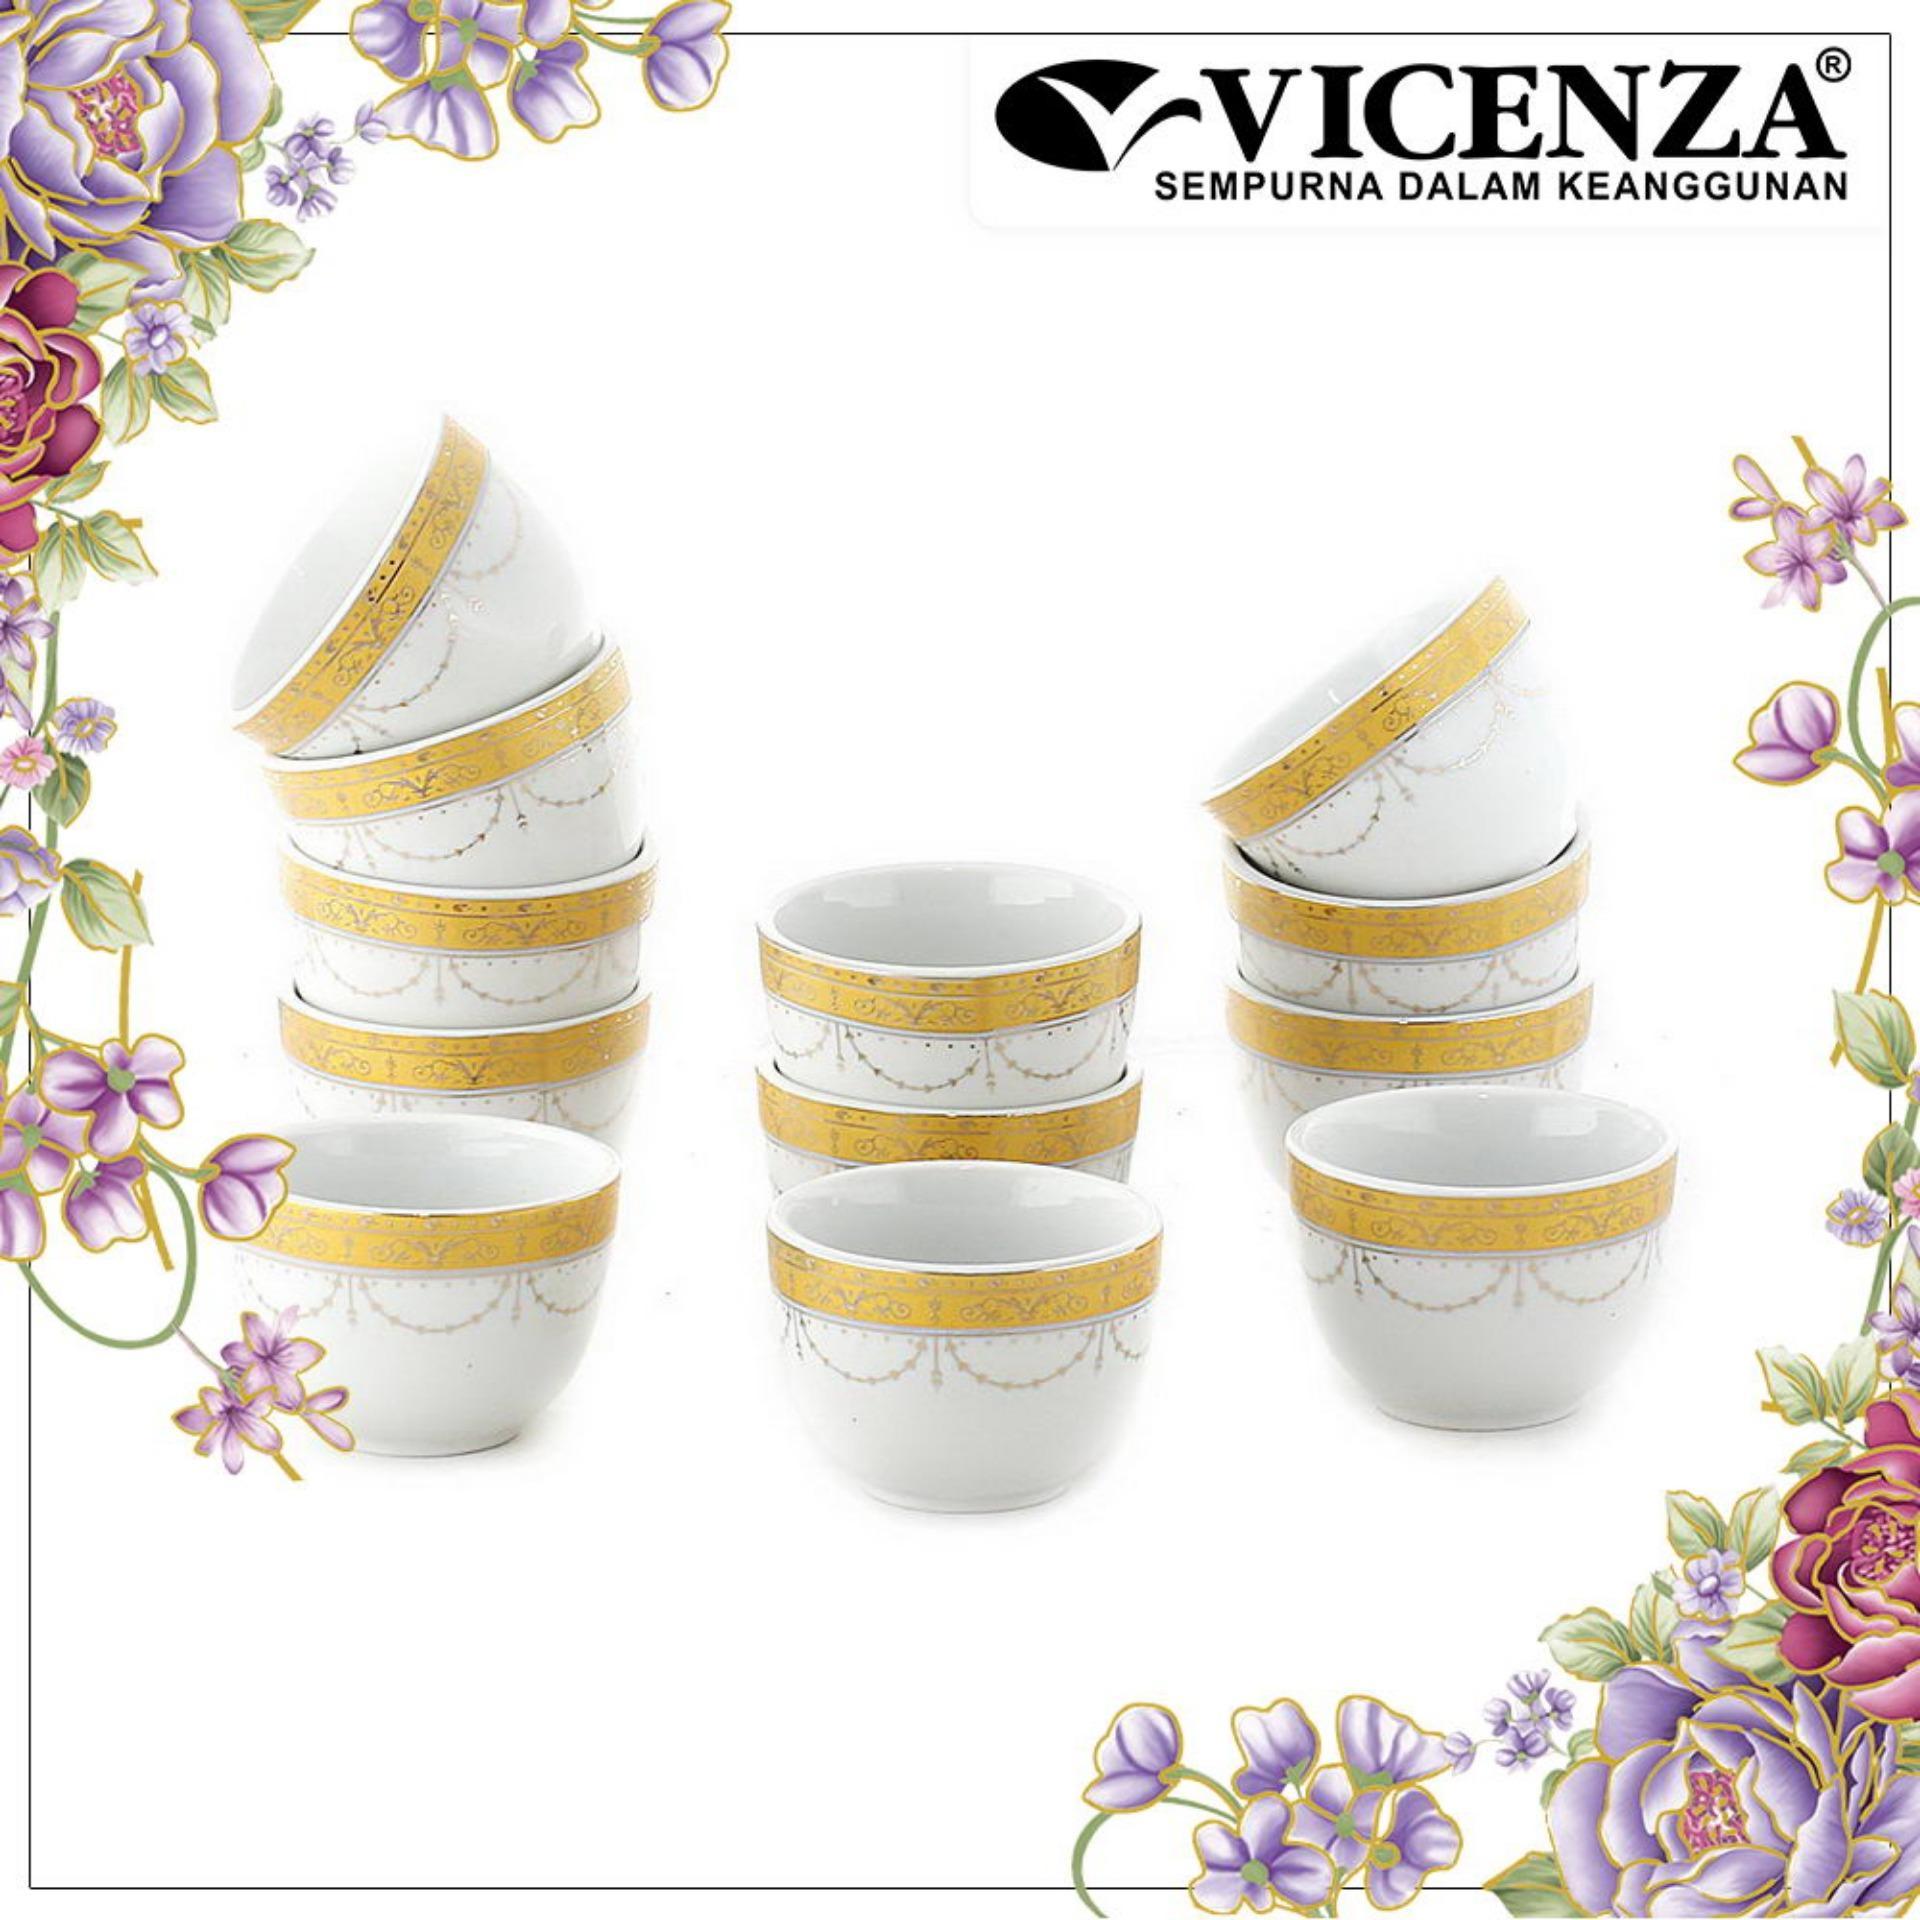 Jual Vicenza Tableware C111 Cangkir Kecil Small Cup Vicenza